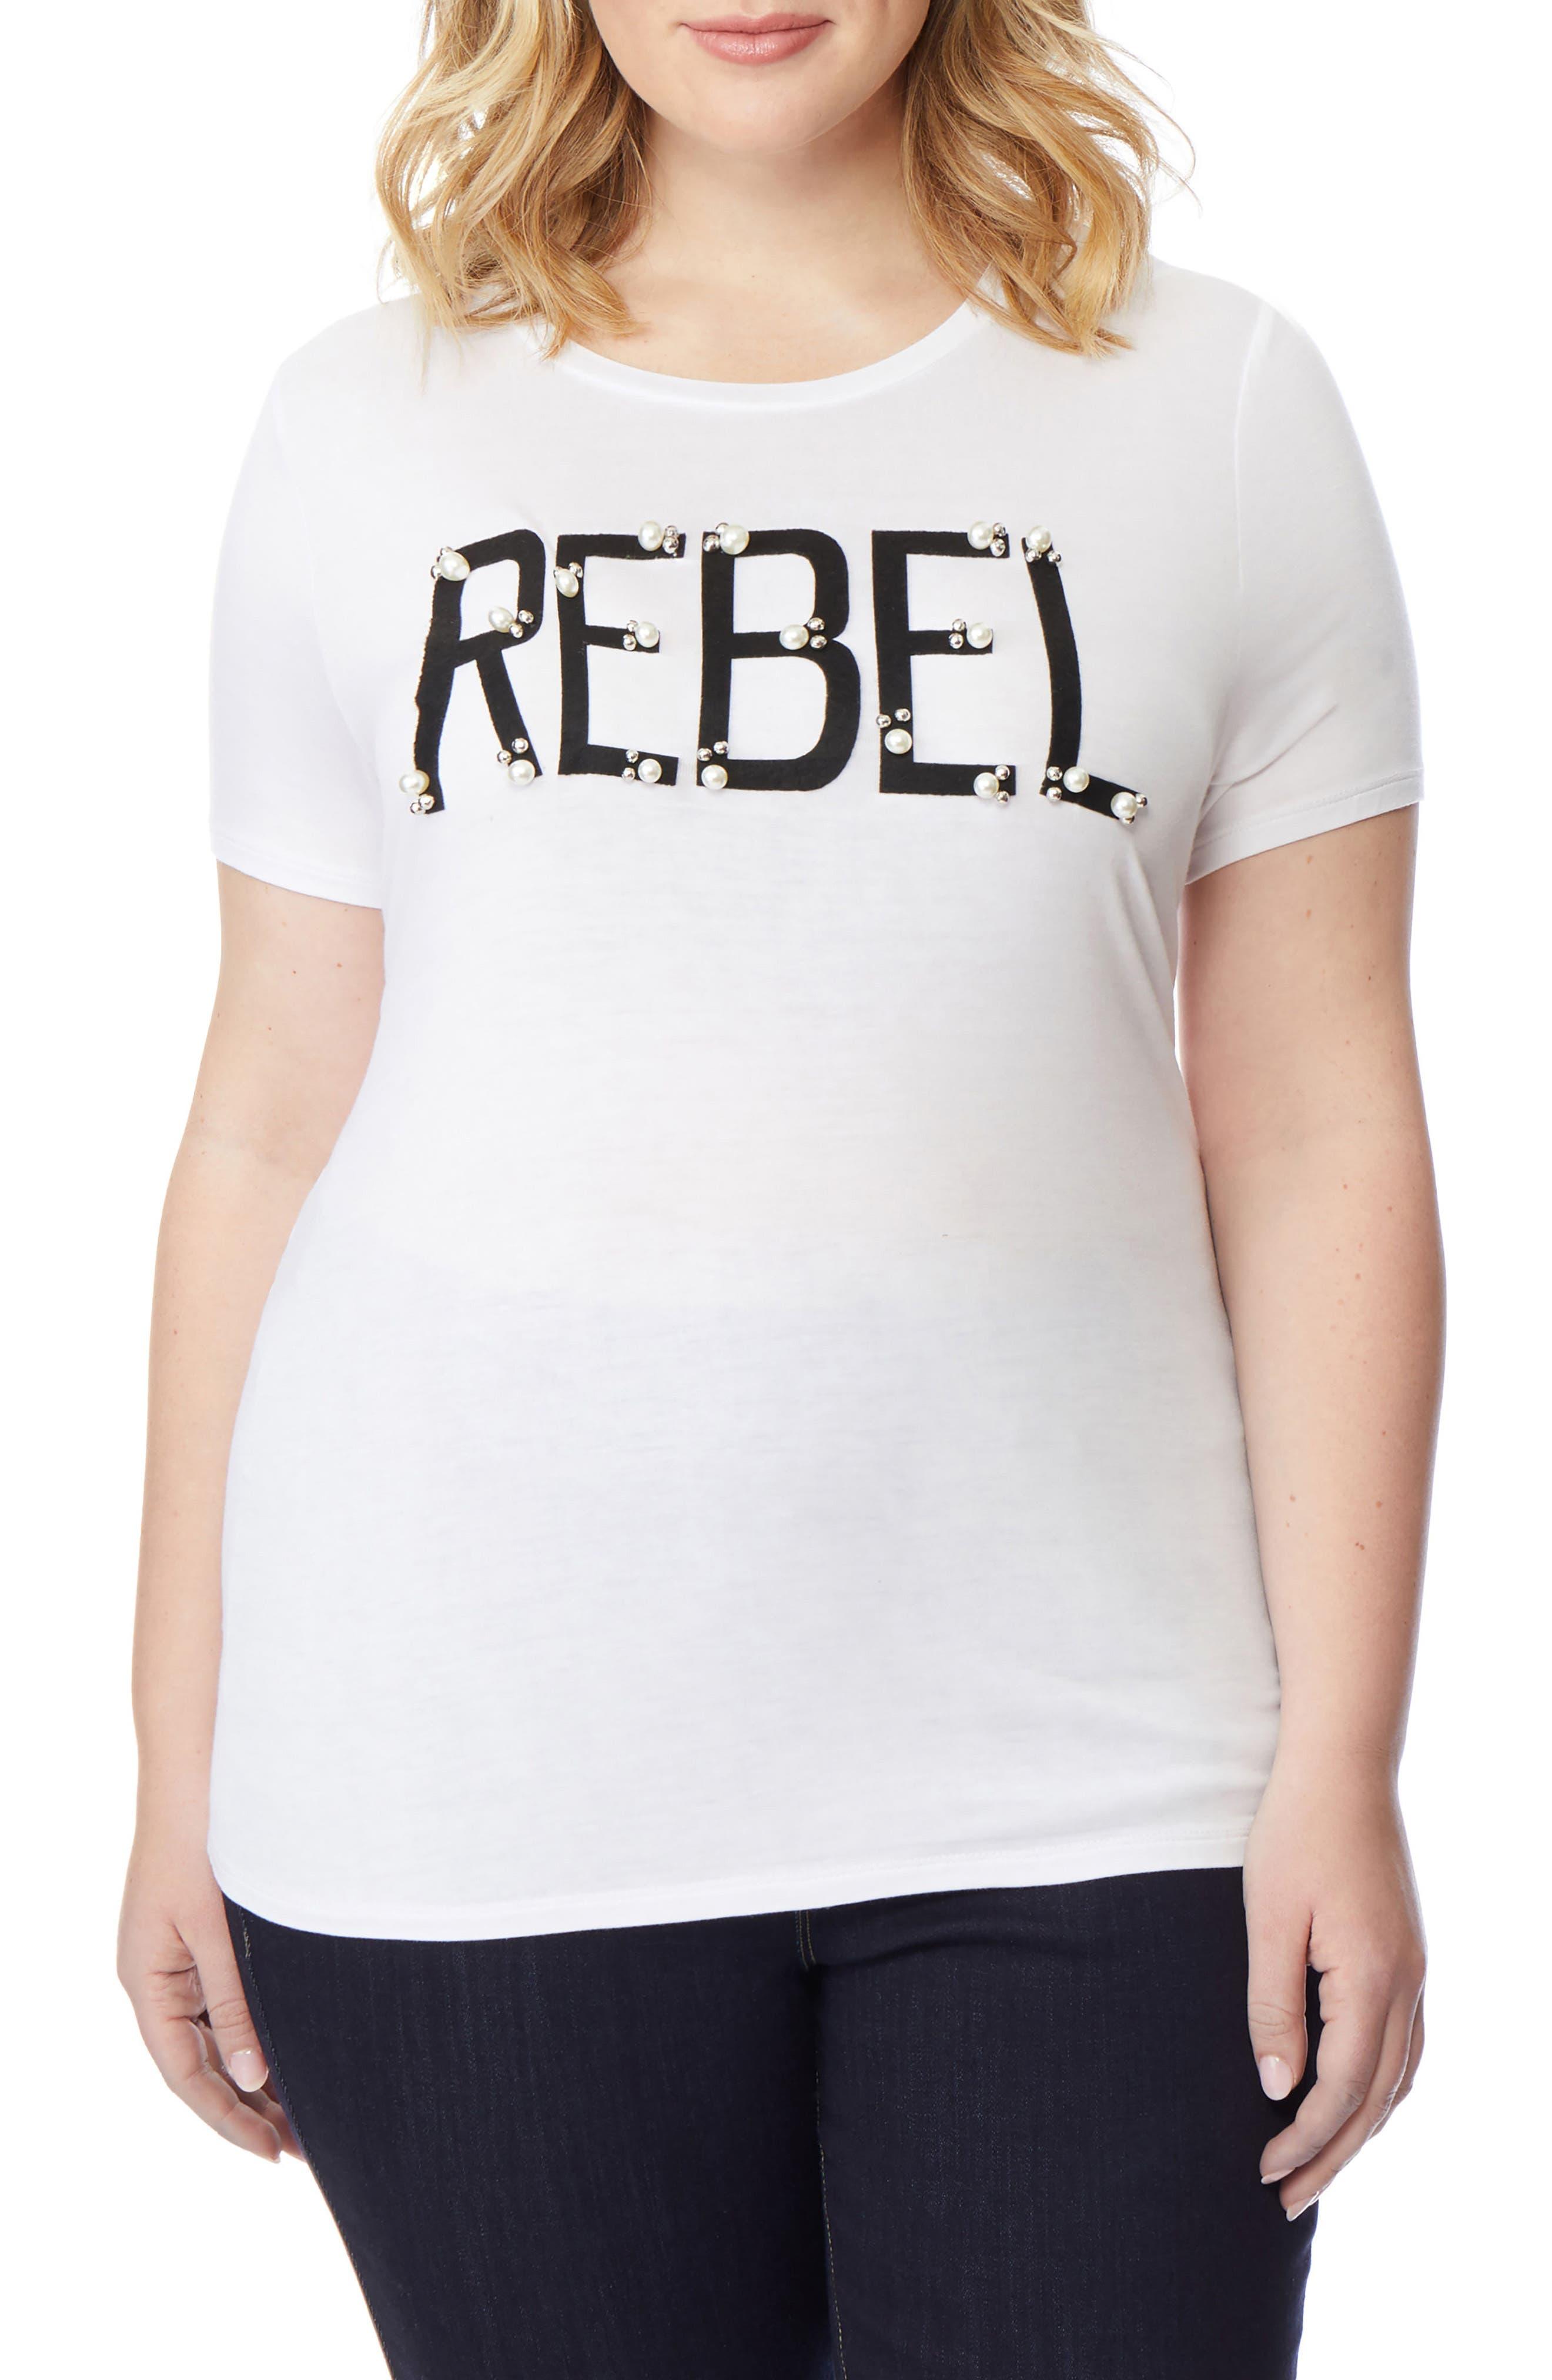 REBEL WILSON X ANGELS Rebel Embellished Graphic Tee, Main, color, 107